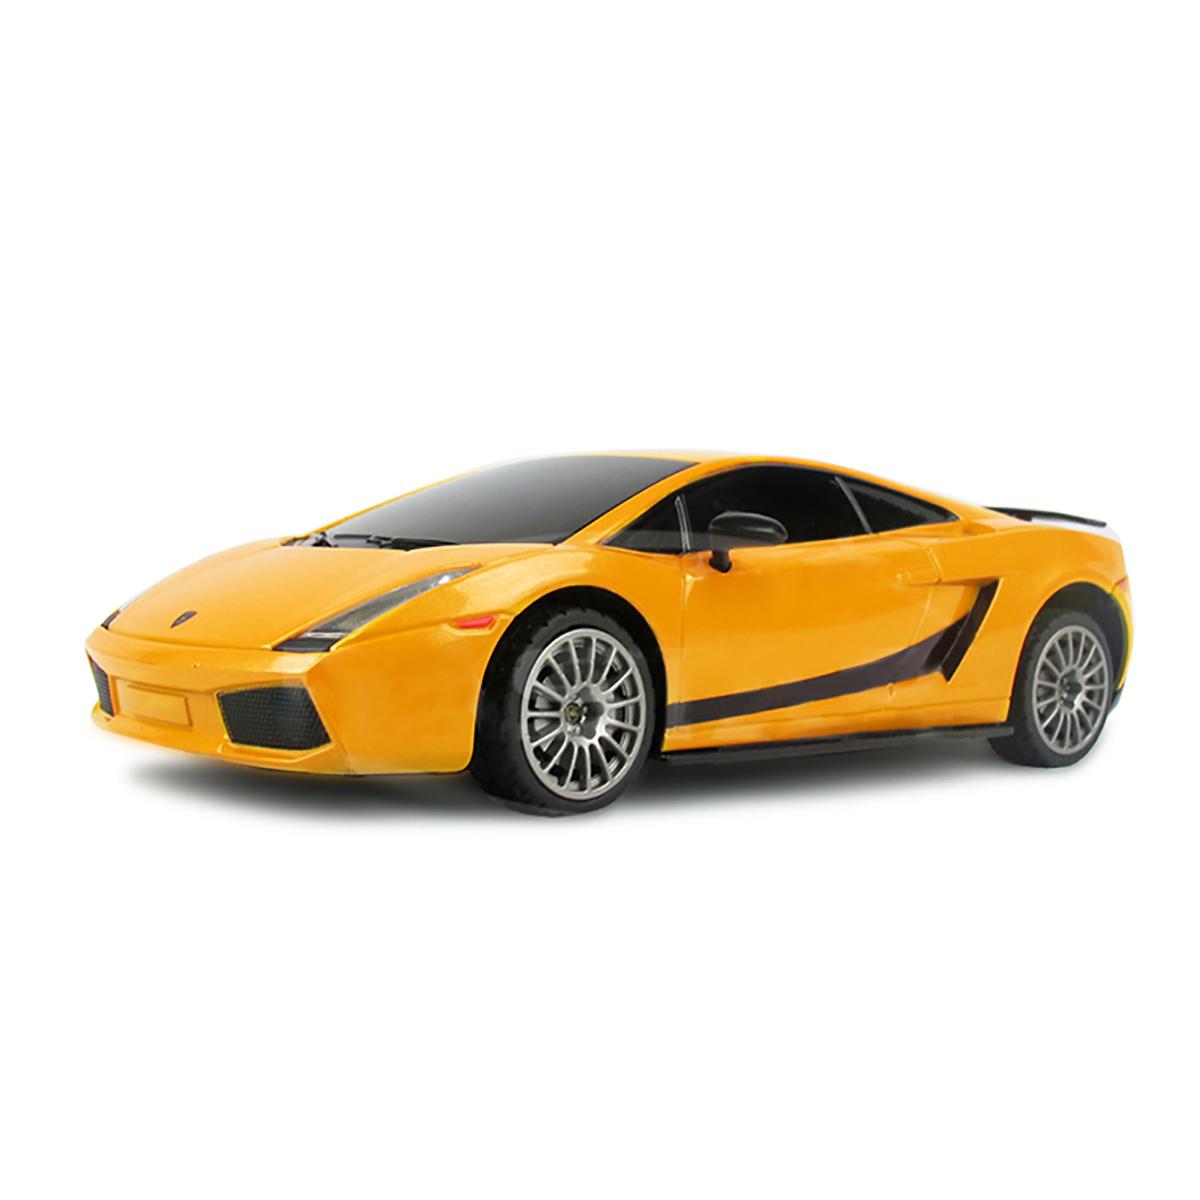 Masinuta cu telecomanda Rastar Lamborghini Superleggera, Galben, 1:24